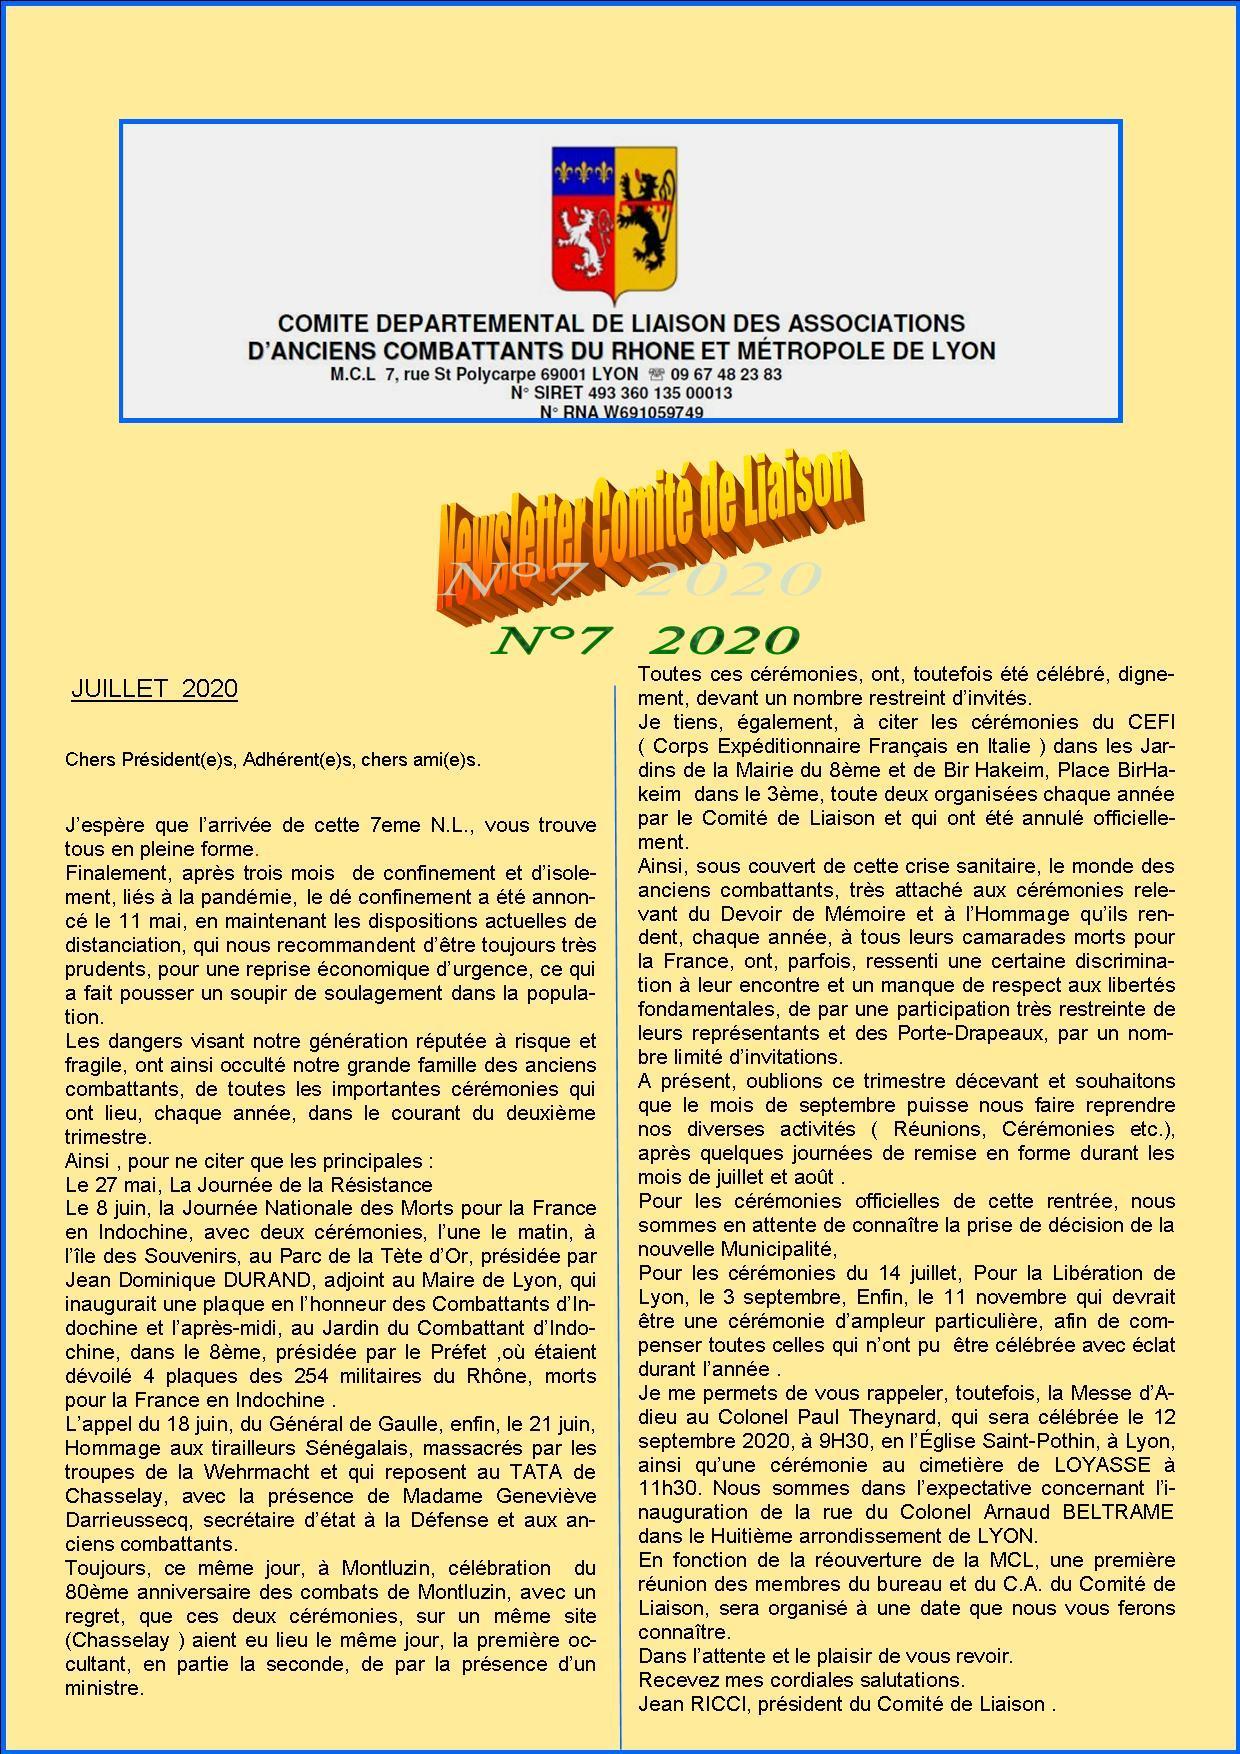 Newsletter comite de liaisonn 7 2020